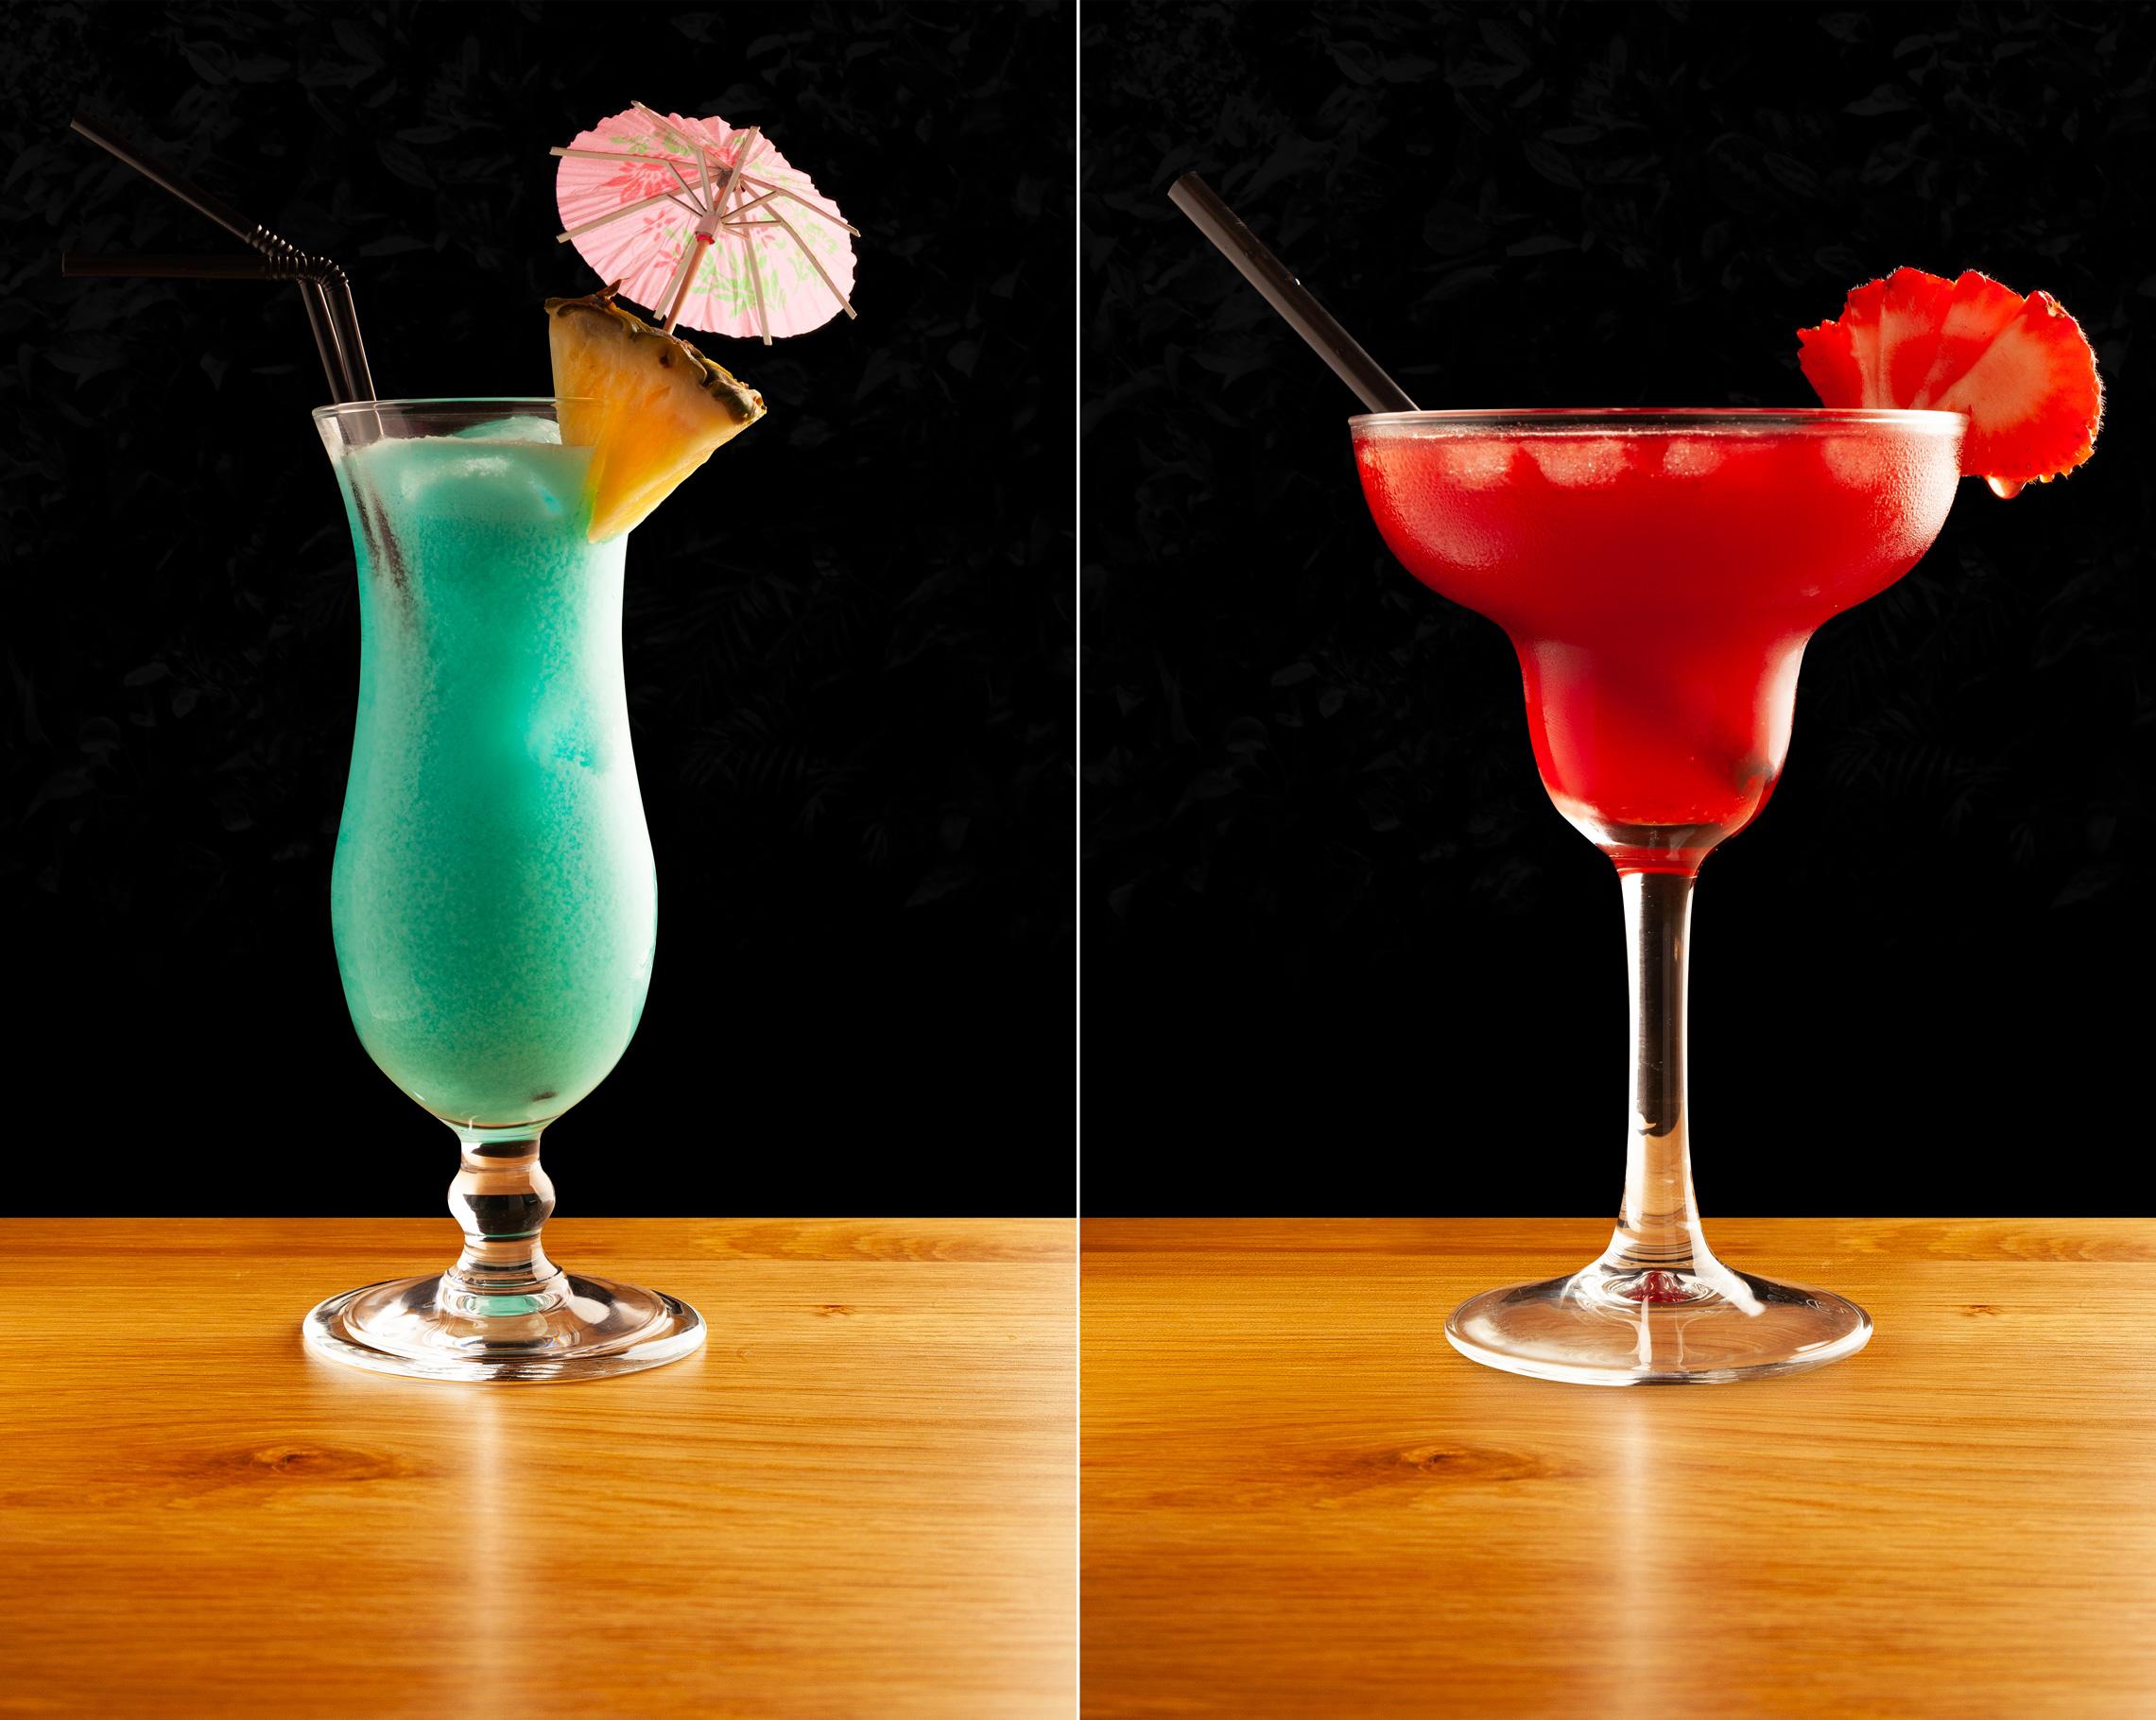 Cabana Restaurant Diseño Web + Fotografía Corporativa